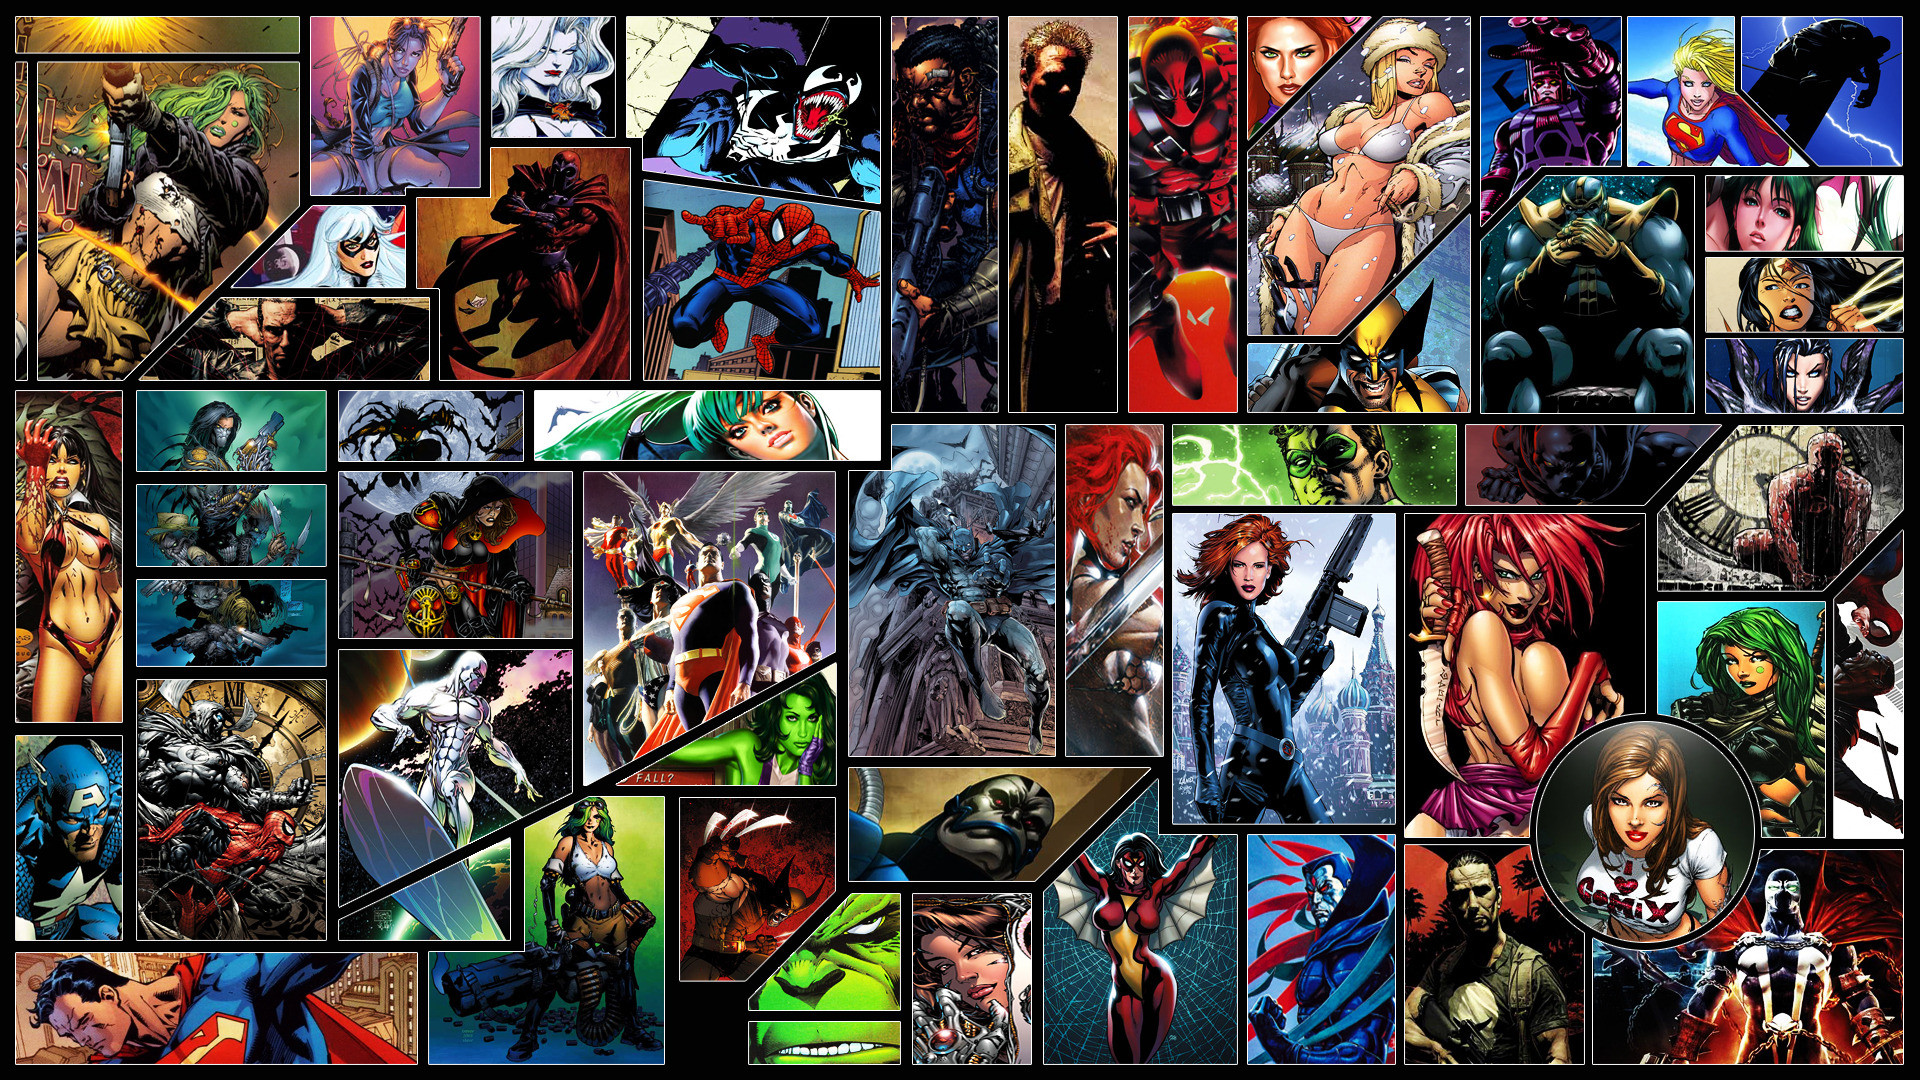 comic-book-characters-comic-hd-wallpaper-1920×1080-2199.